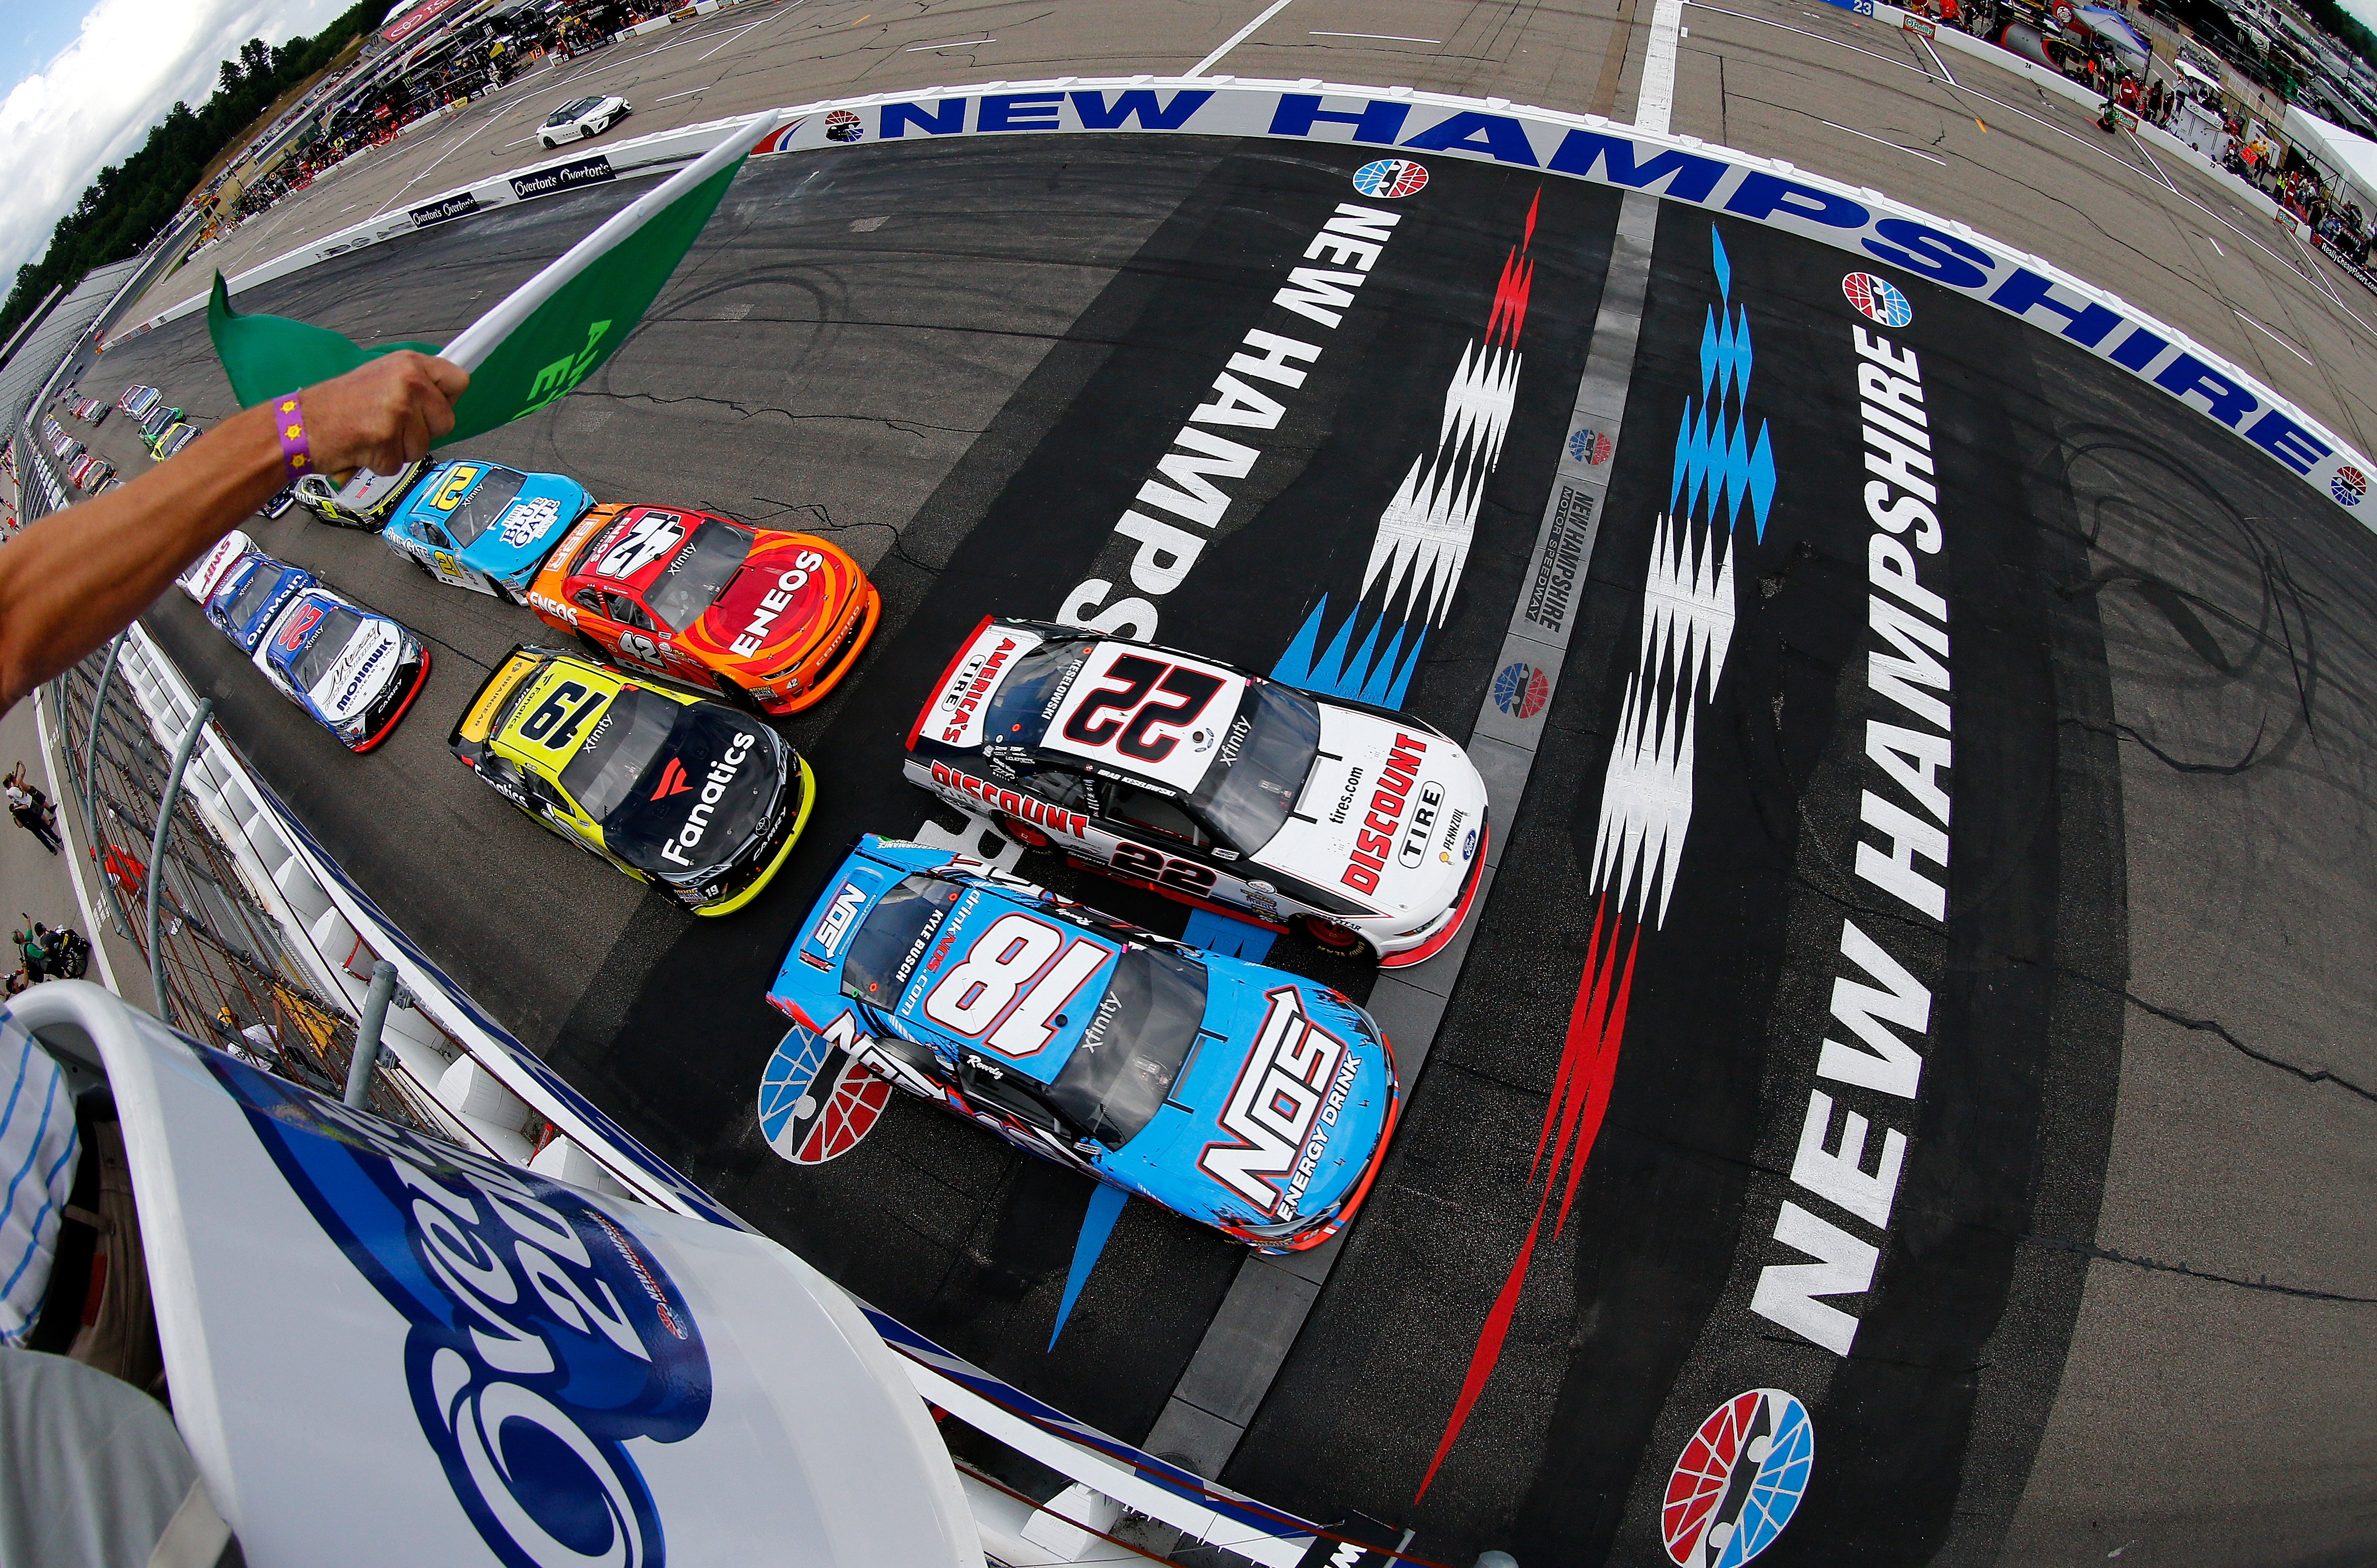 New Hampshire Results - July 15, 2017 - NASCAR Xfinity Series